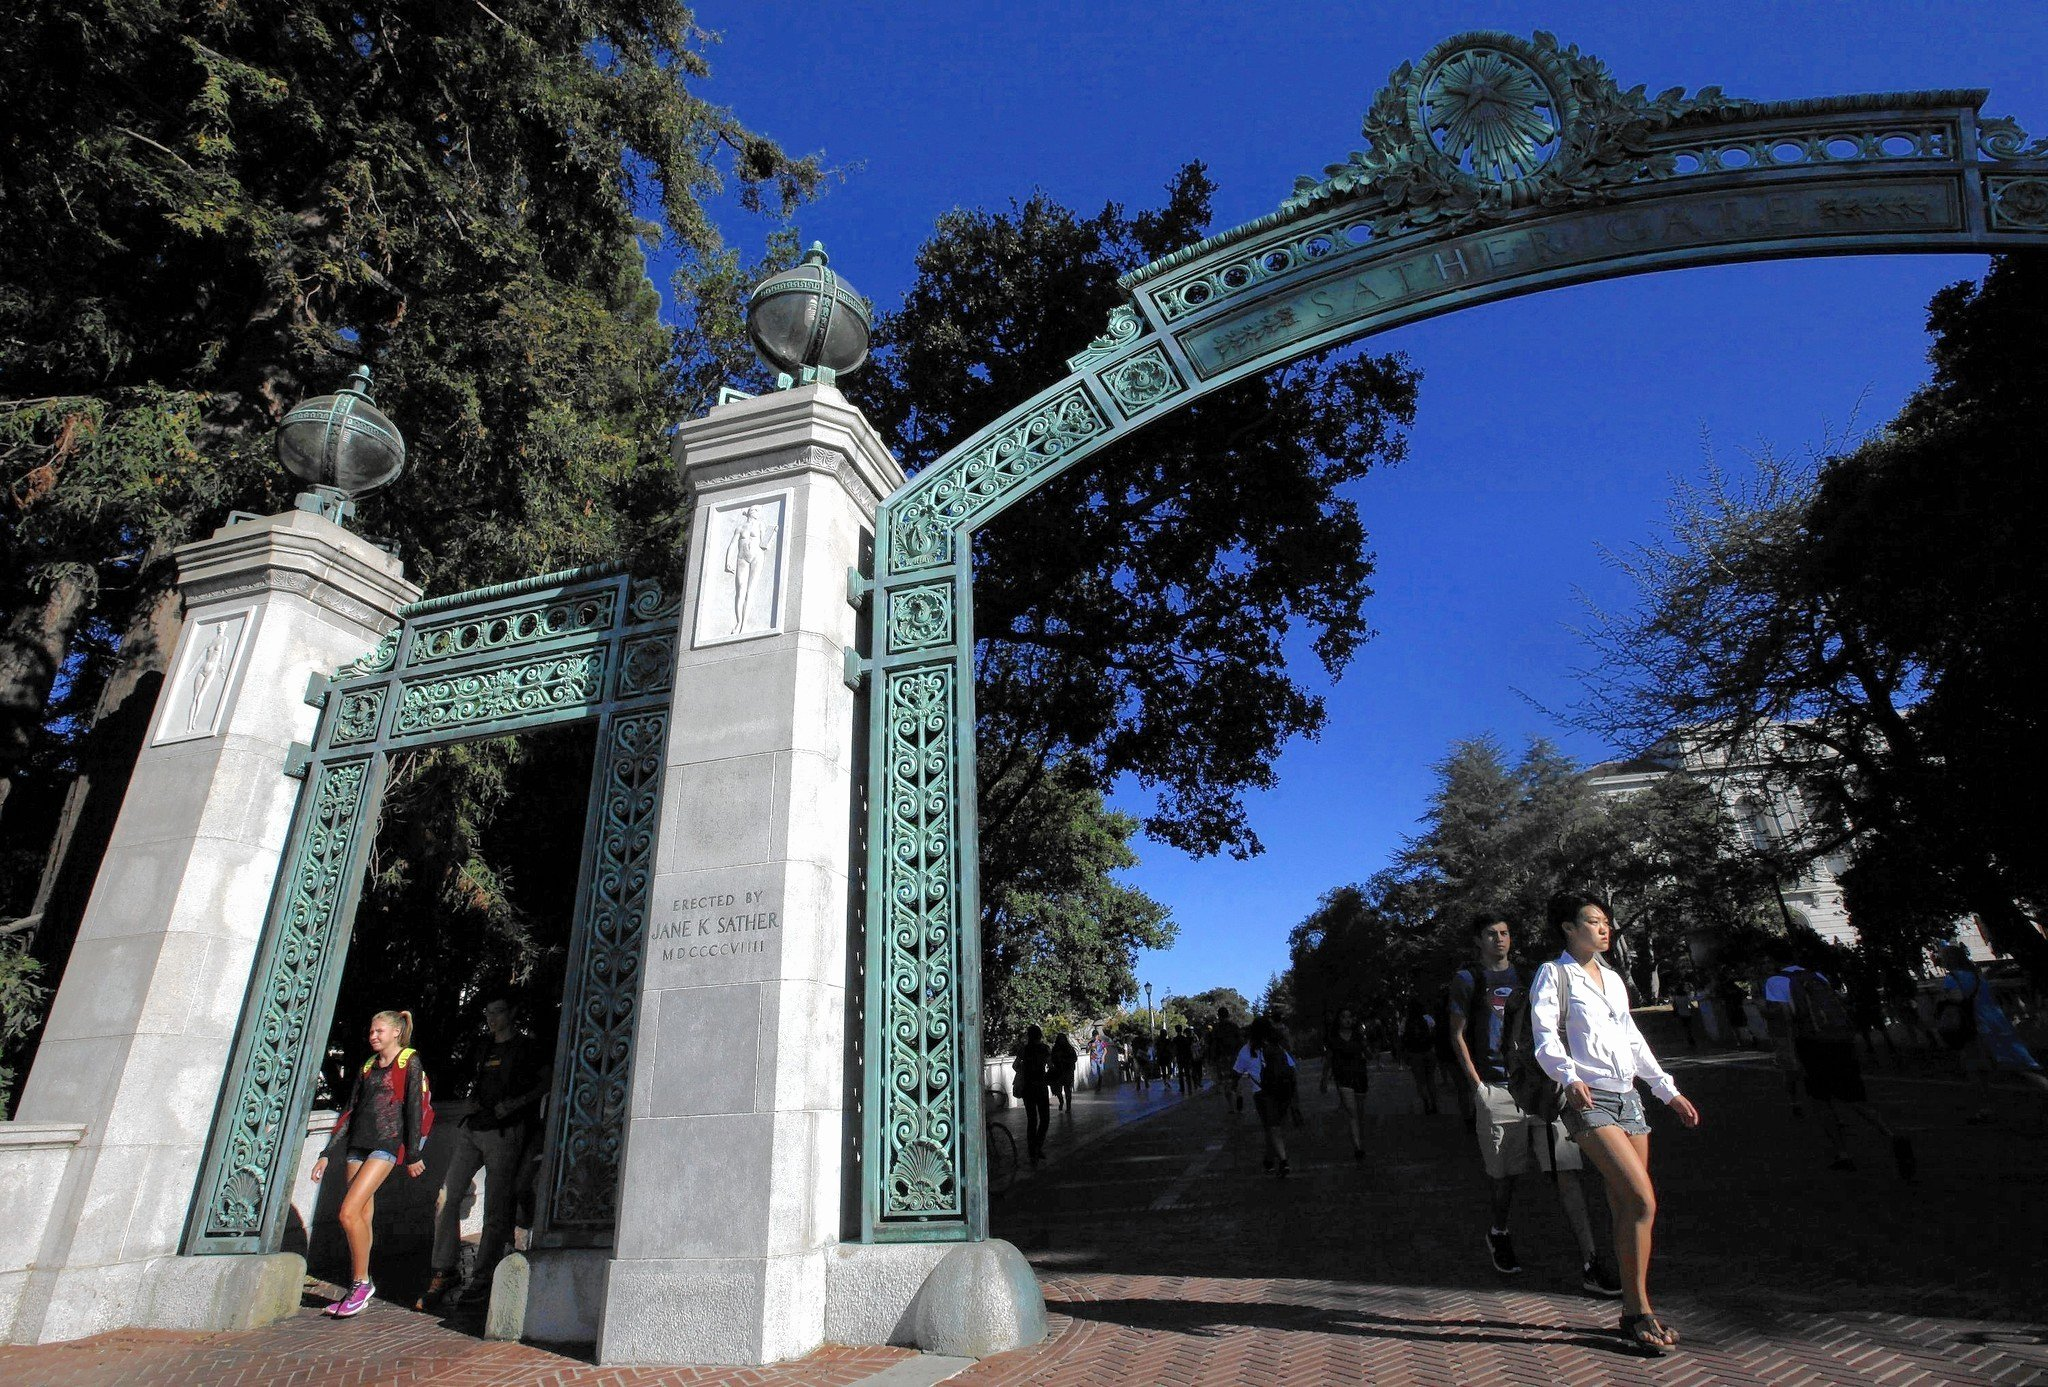 Uc Berkeley Recommendation Letter Inspirational Uc Berkeley Requests Letters Of Re Mendation From